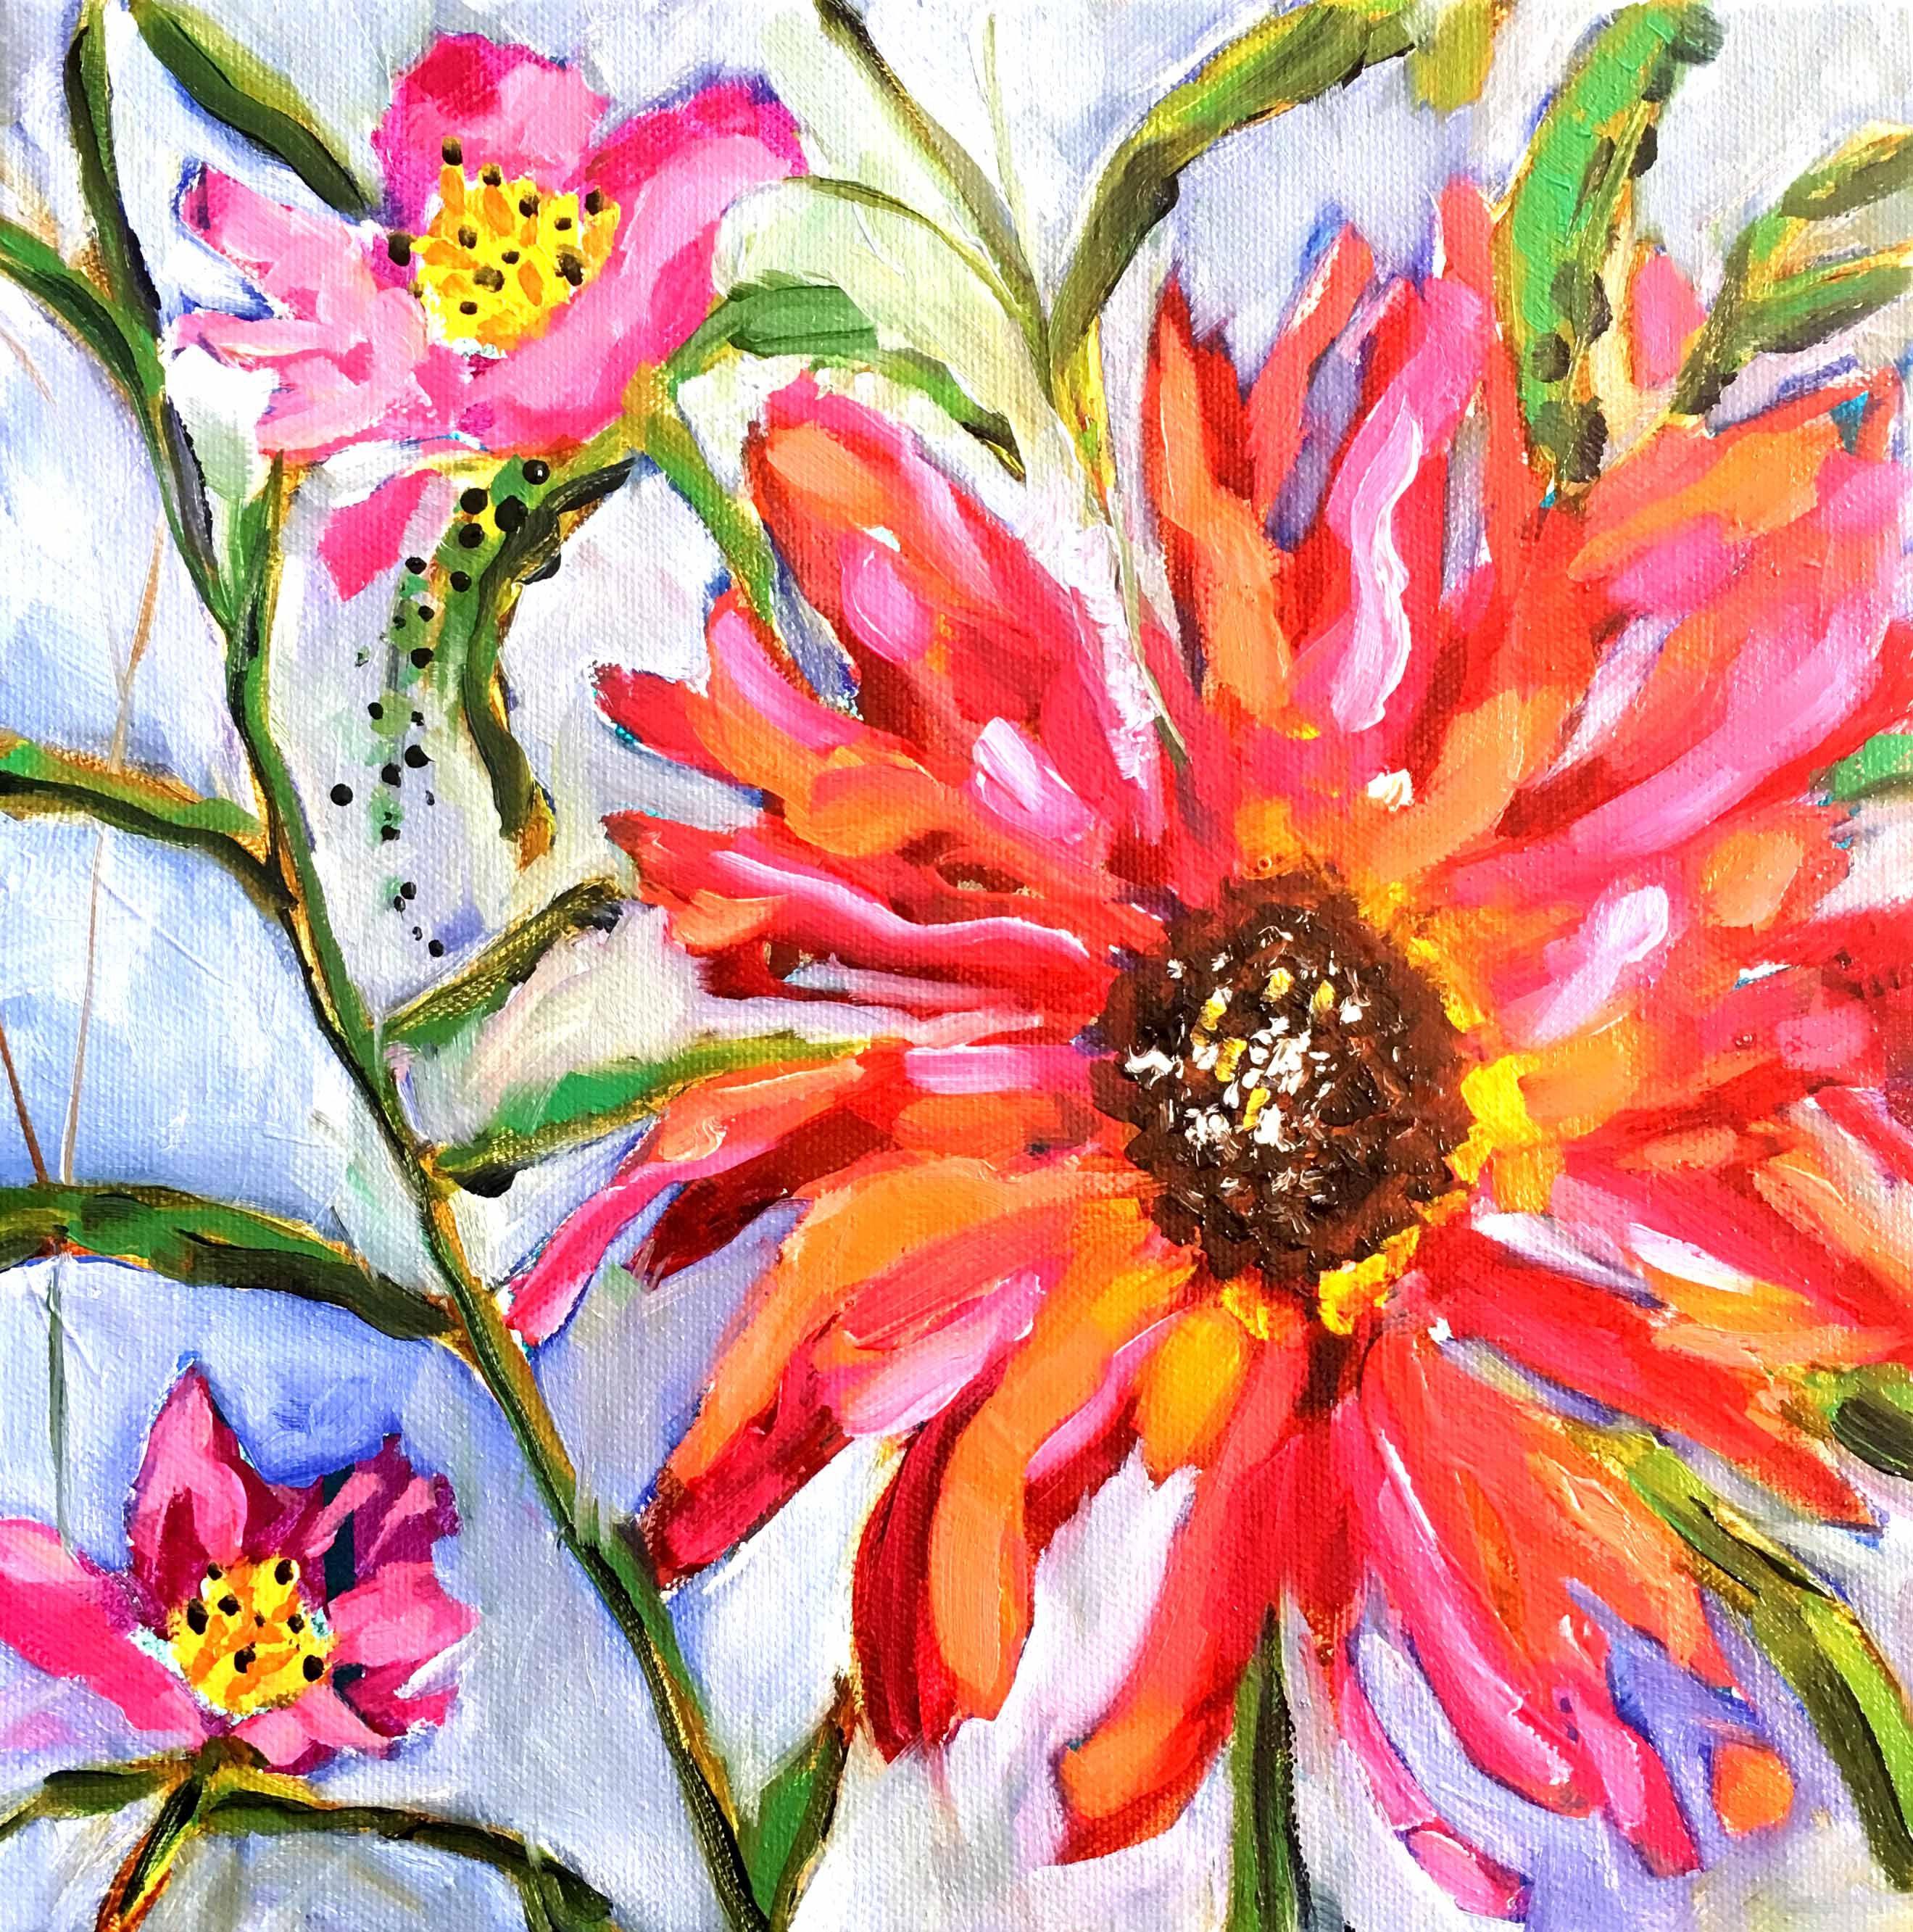 Vibrant abstract floral painting by Nina Ramos. Follow ...